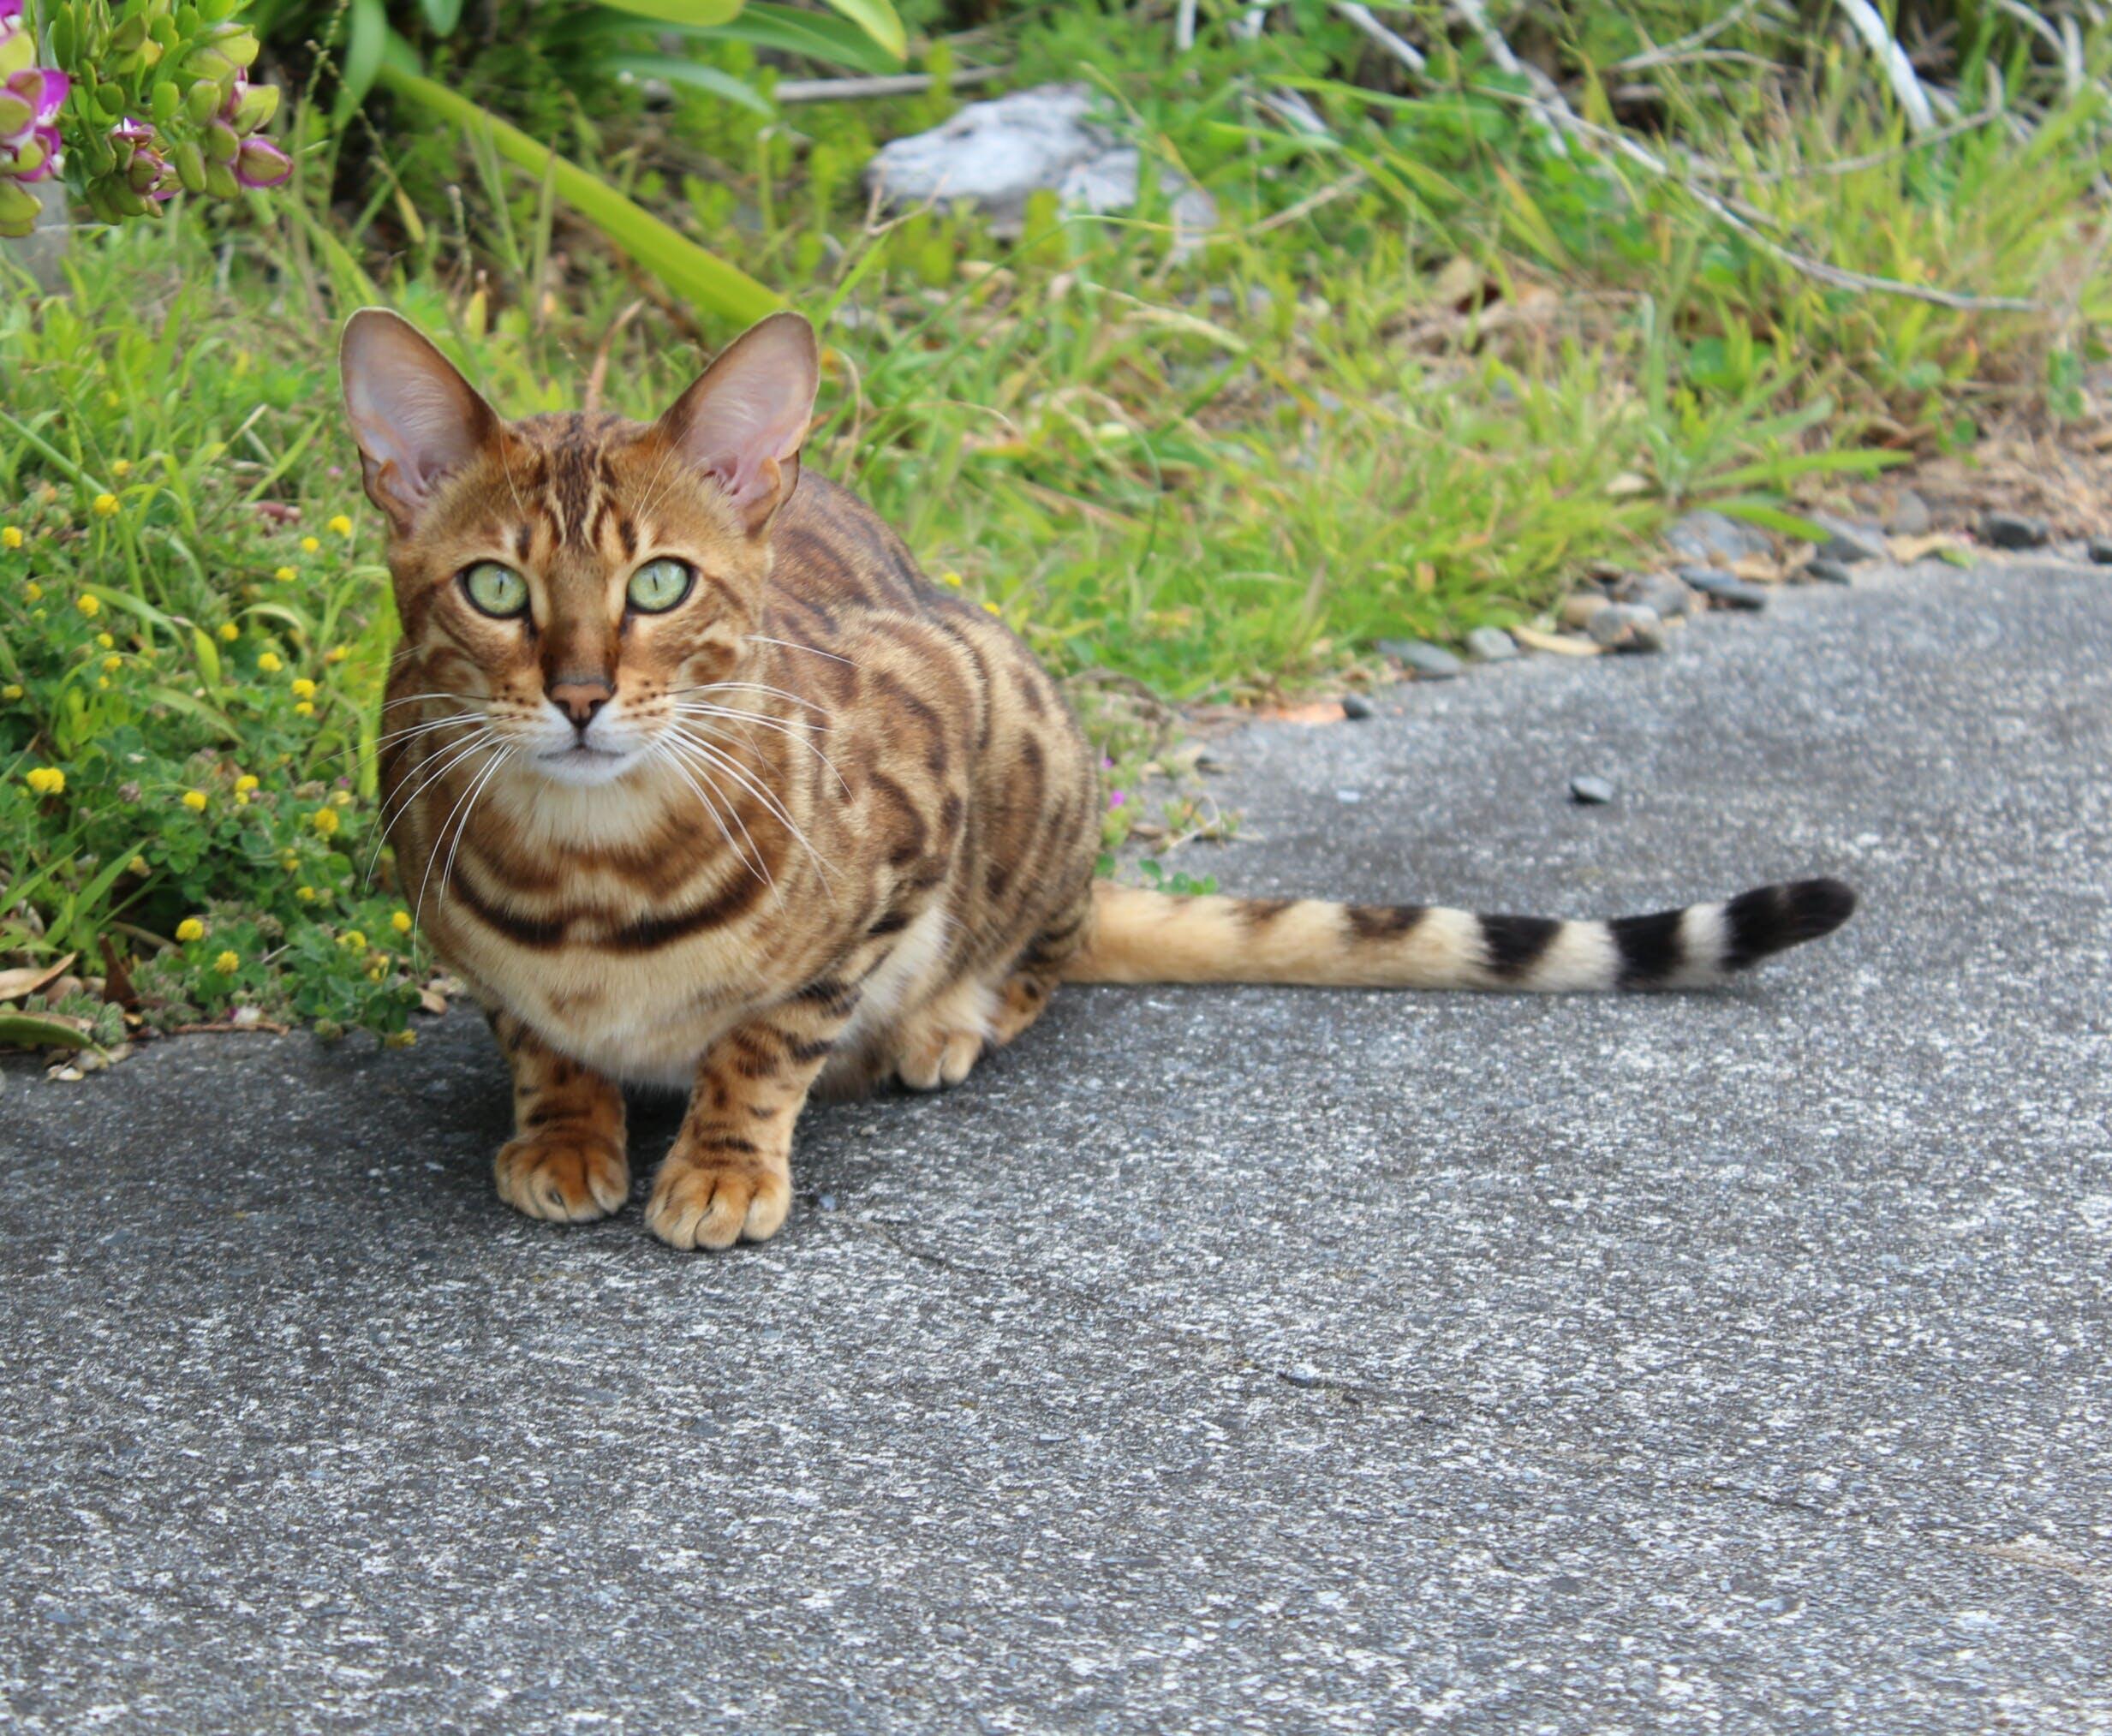 Free stock photo of animal, cat, kitten, nature